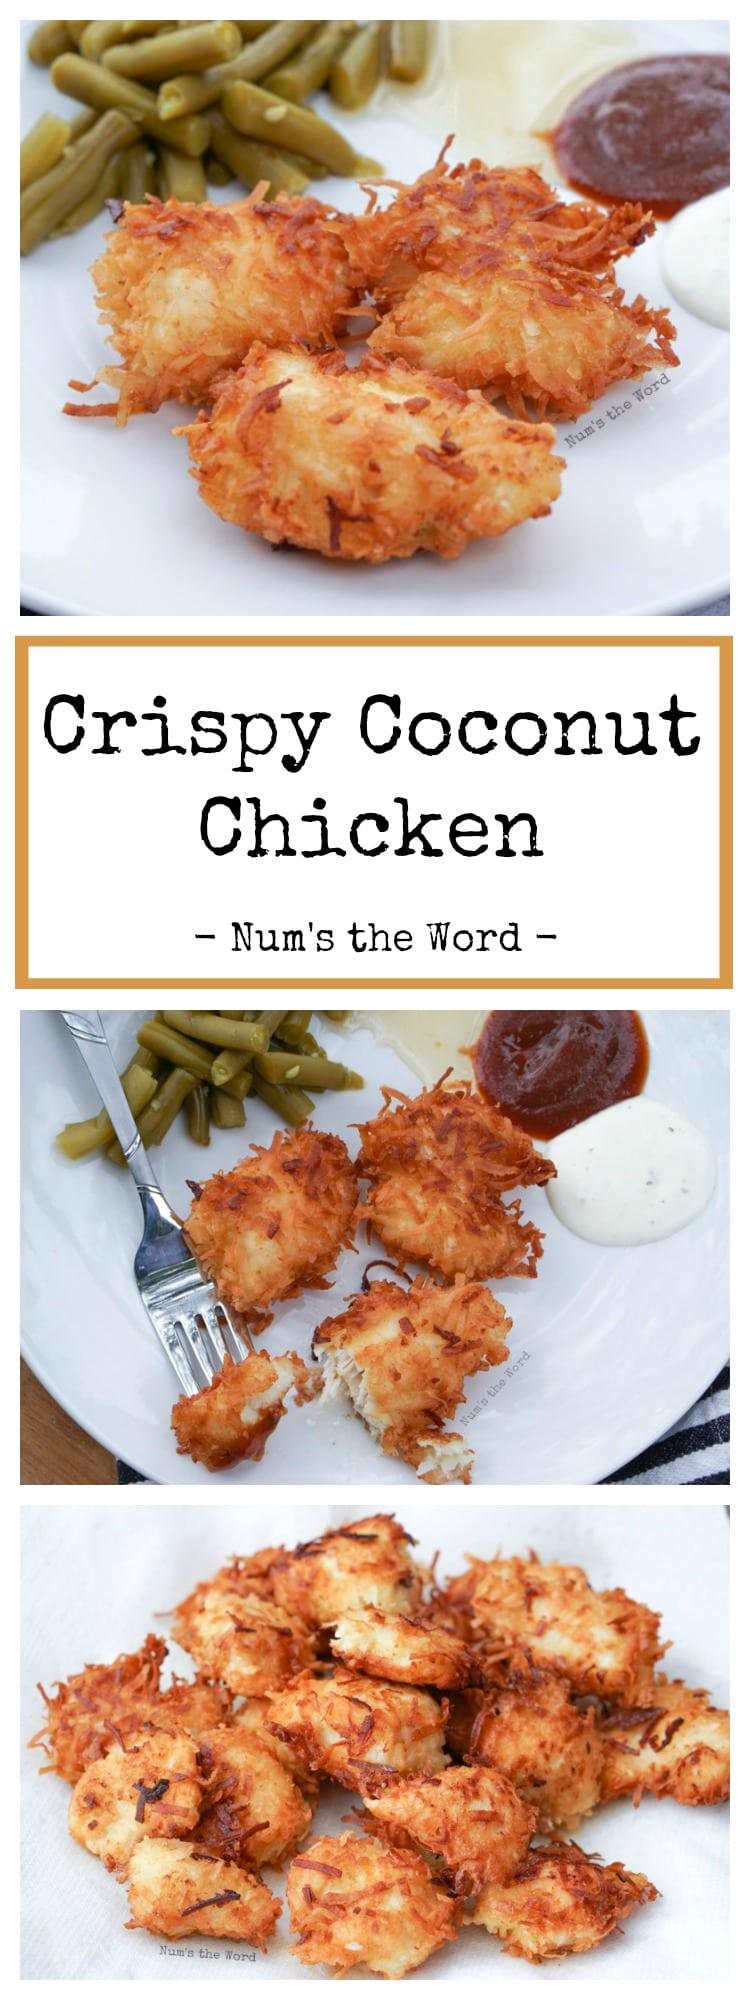 Crispy Coconut Chicken - Pinterest long collage pin